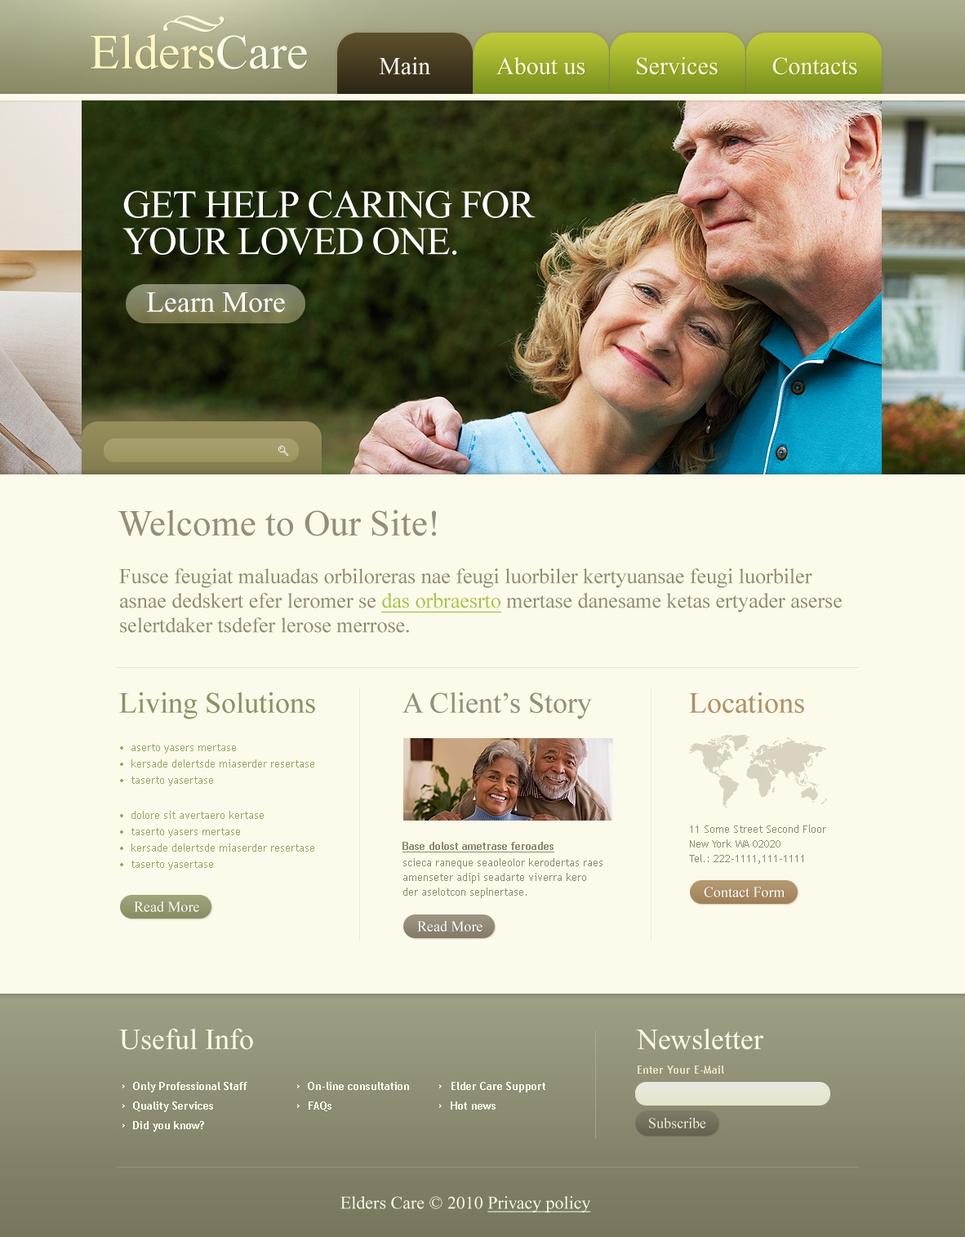 Elders Care Flash Template - image